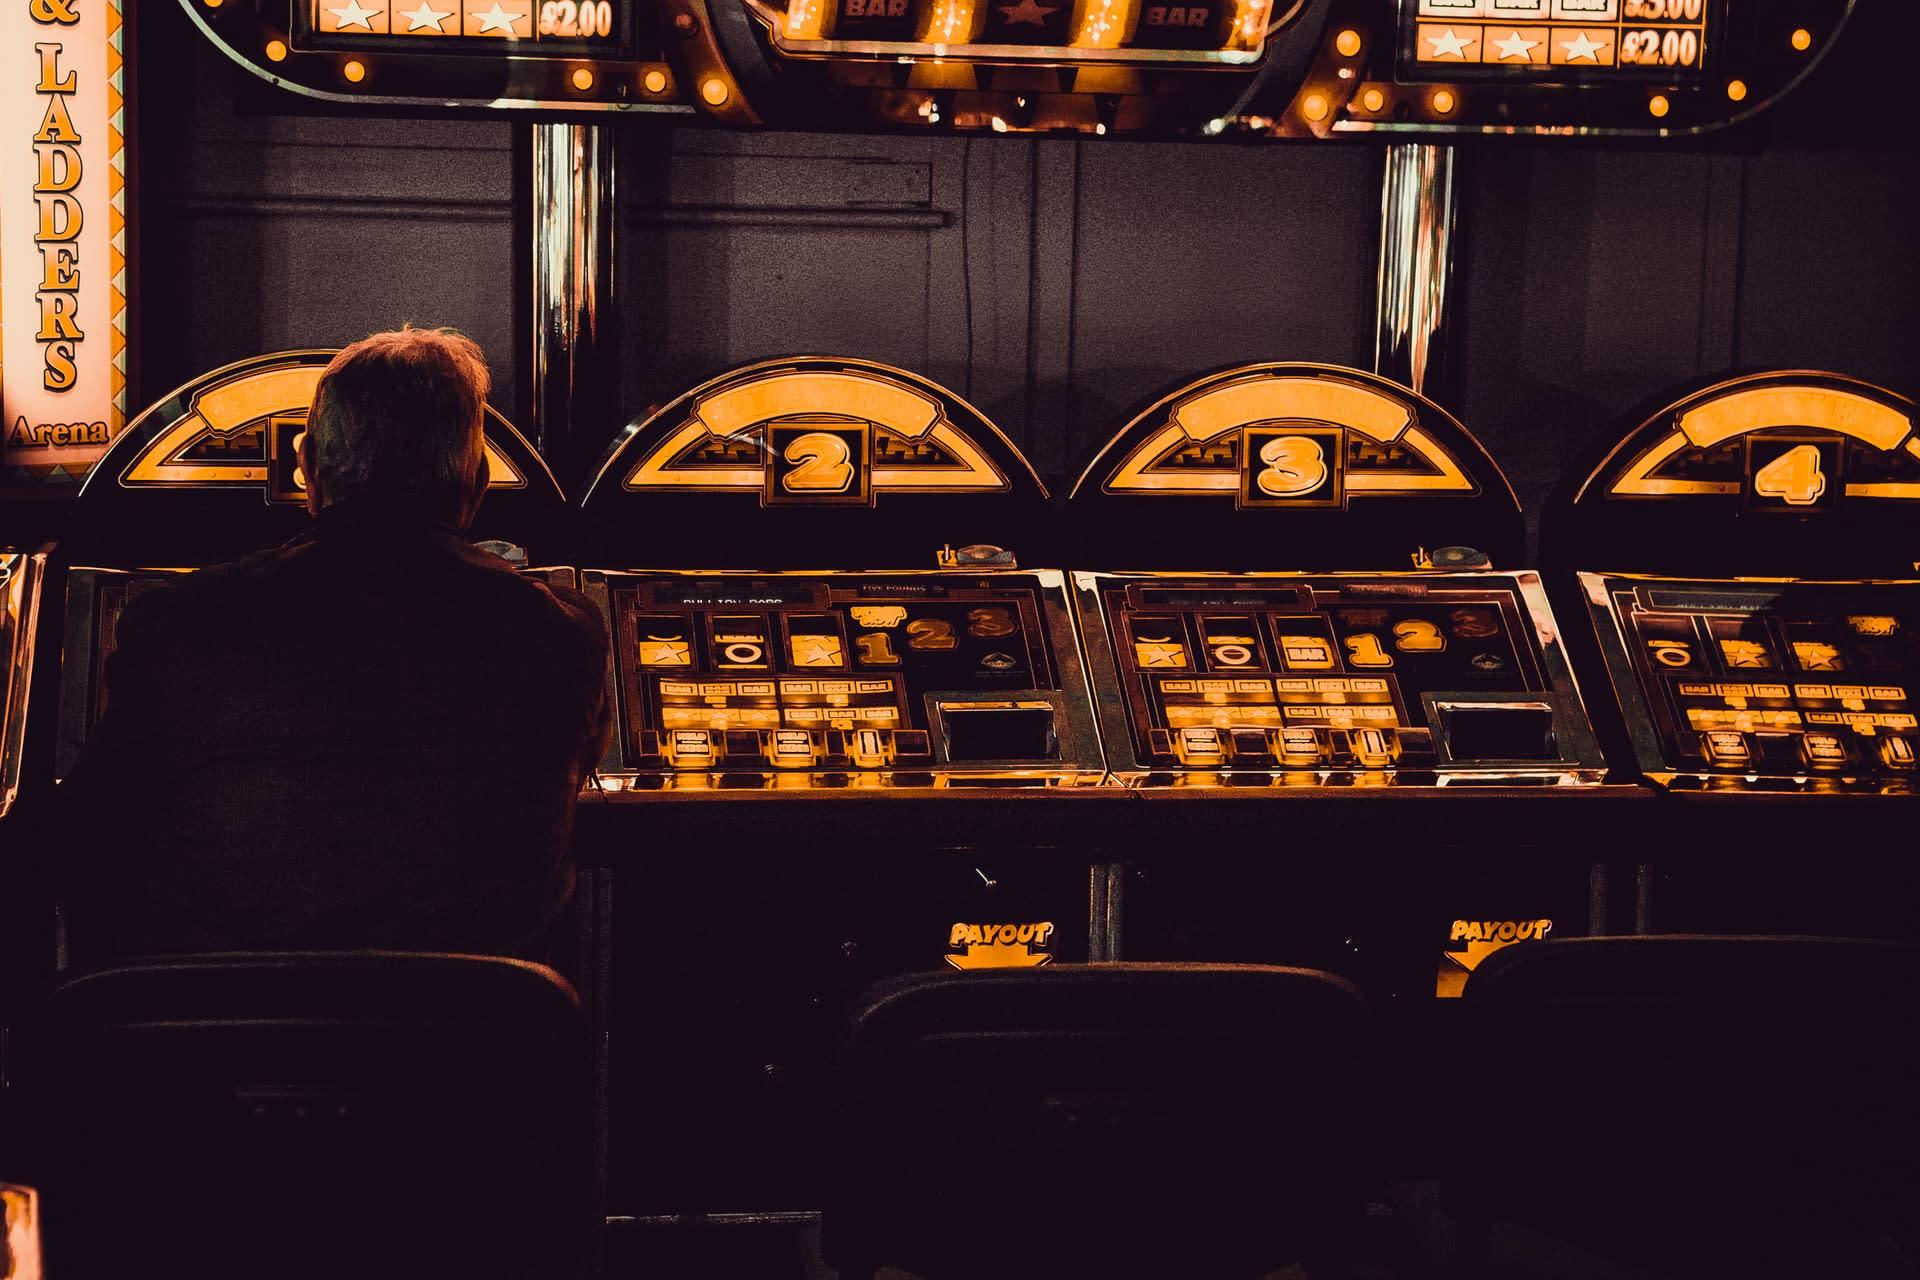 Relax Gaming - online špecialista na poker a bingo